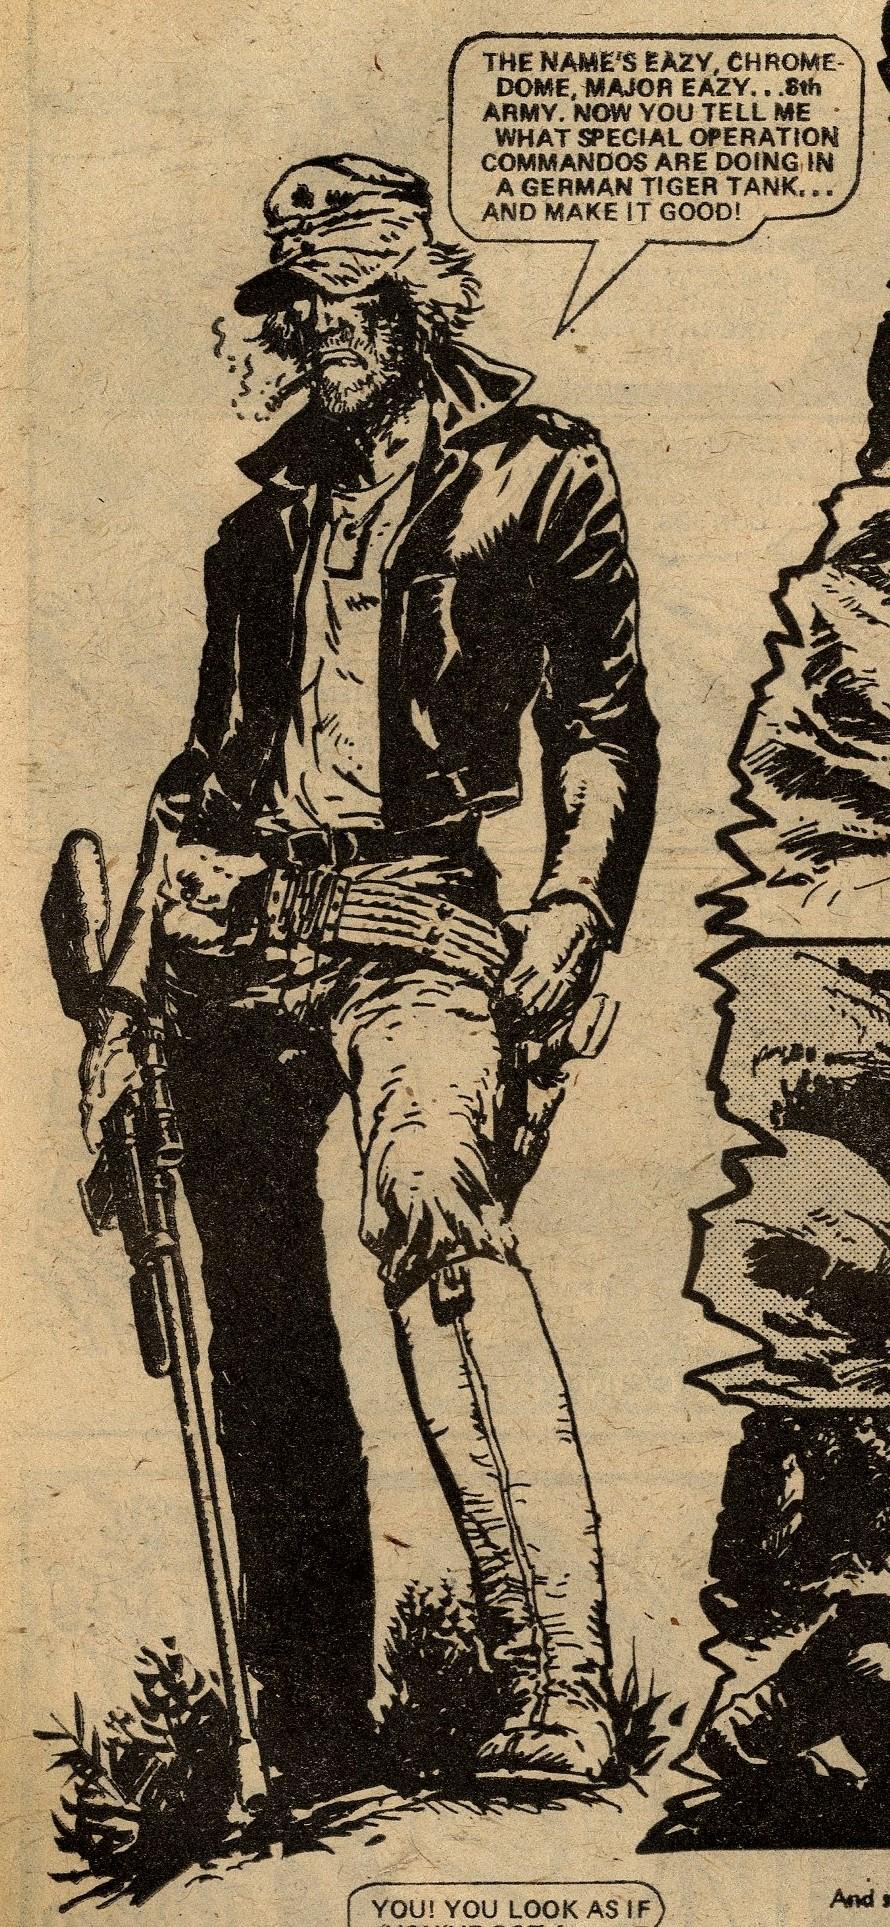 Rat Pack: Alan Hebden (writer), Carlos Ezquerra (artist)